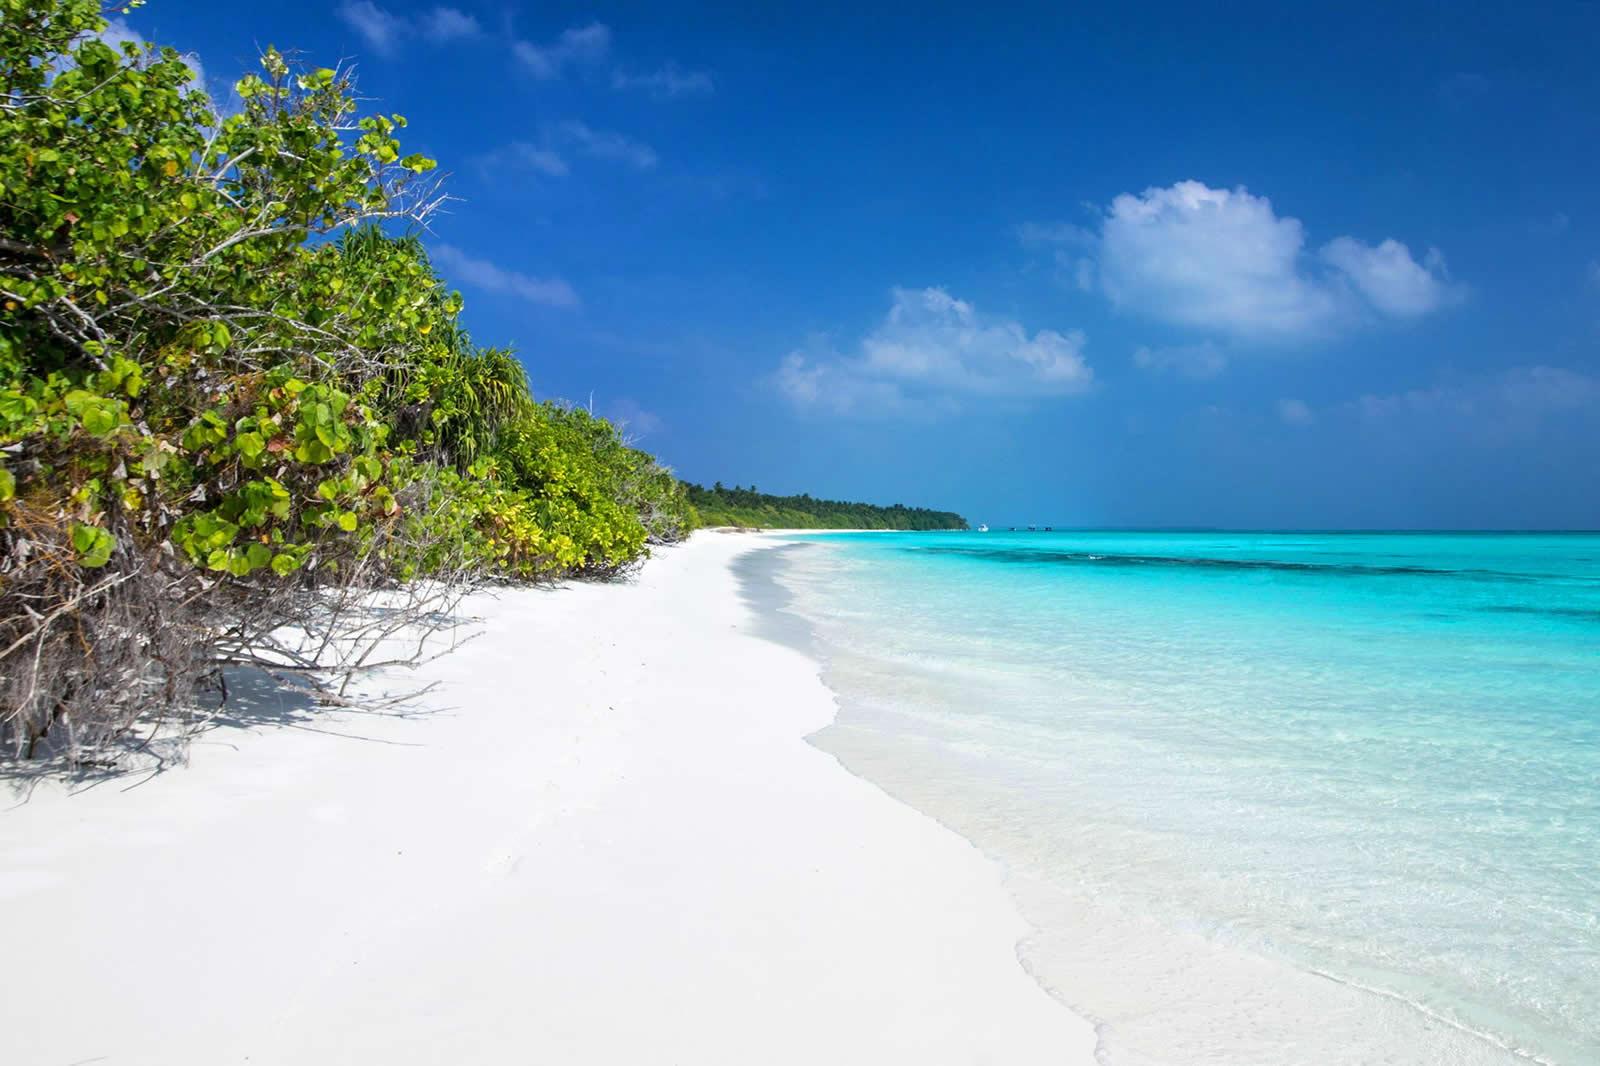 красивый пляж на Fulhadhoo (Фуладу)